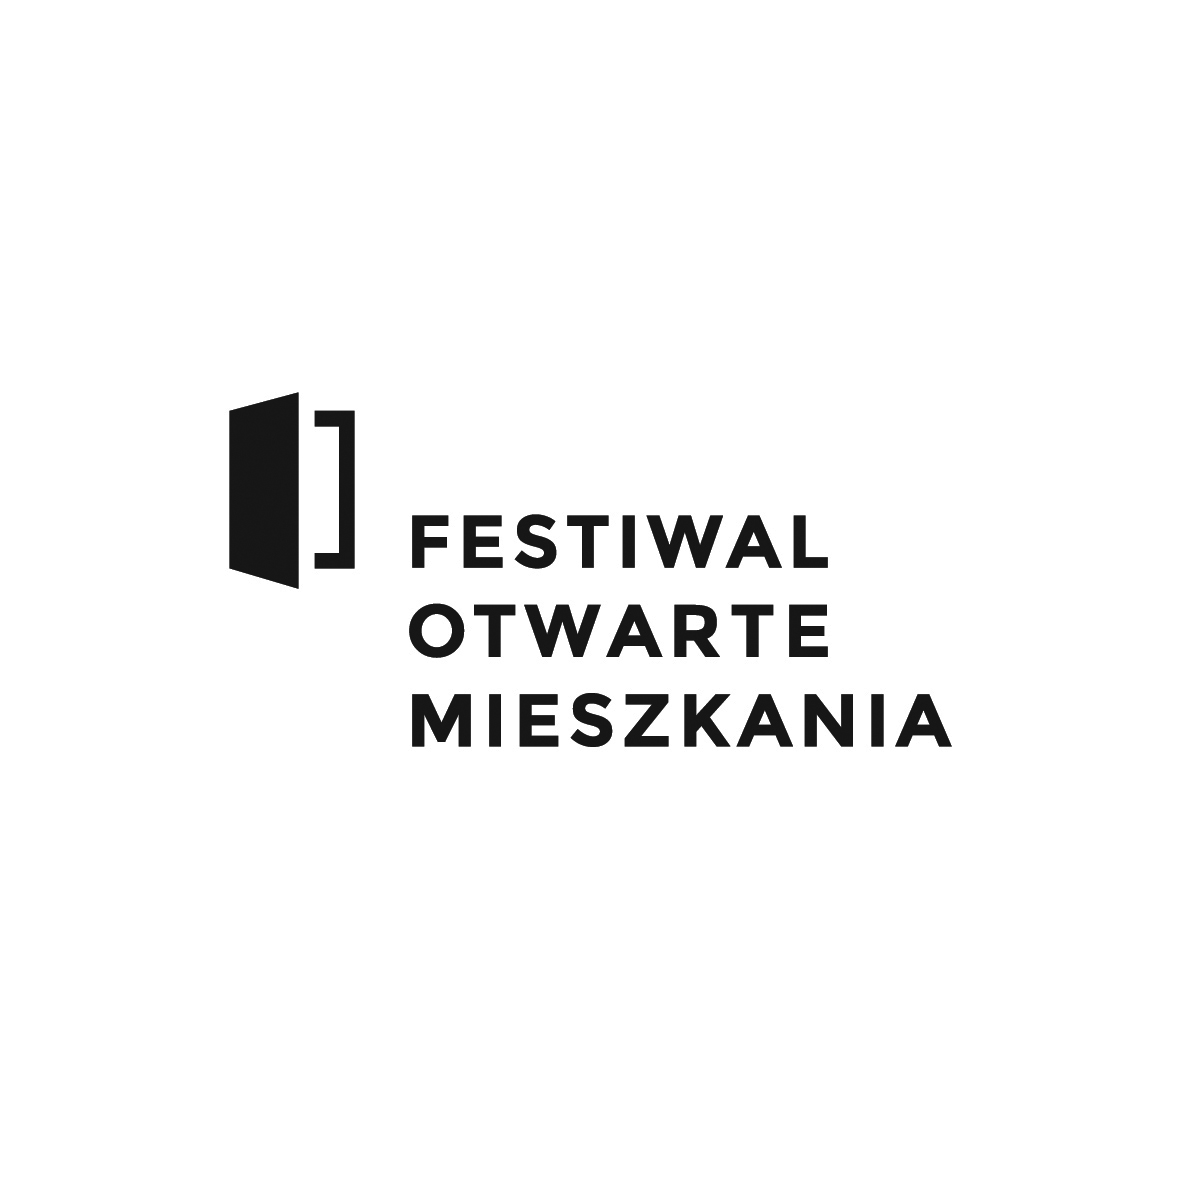 II Festiwal Otwarte Mieszkania